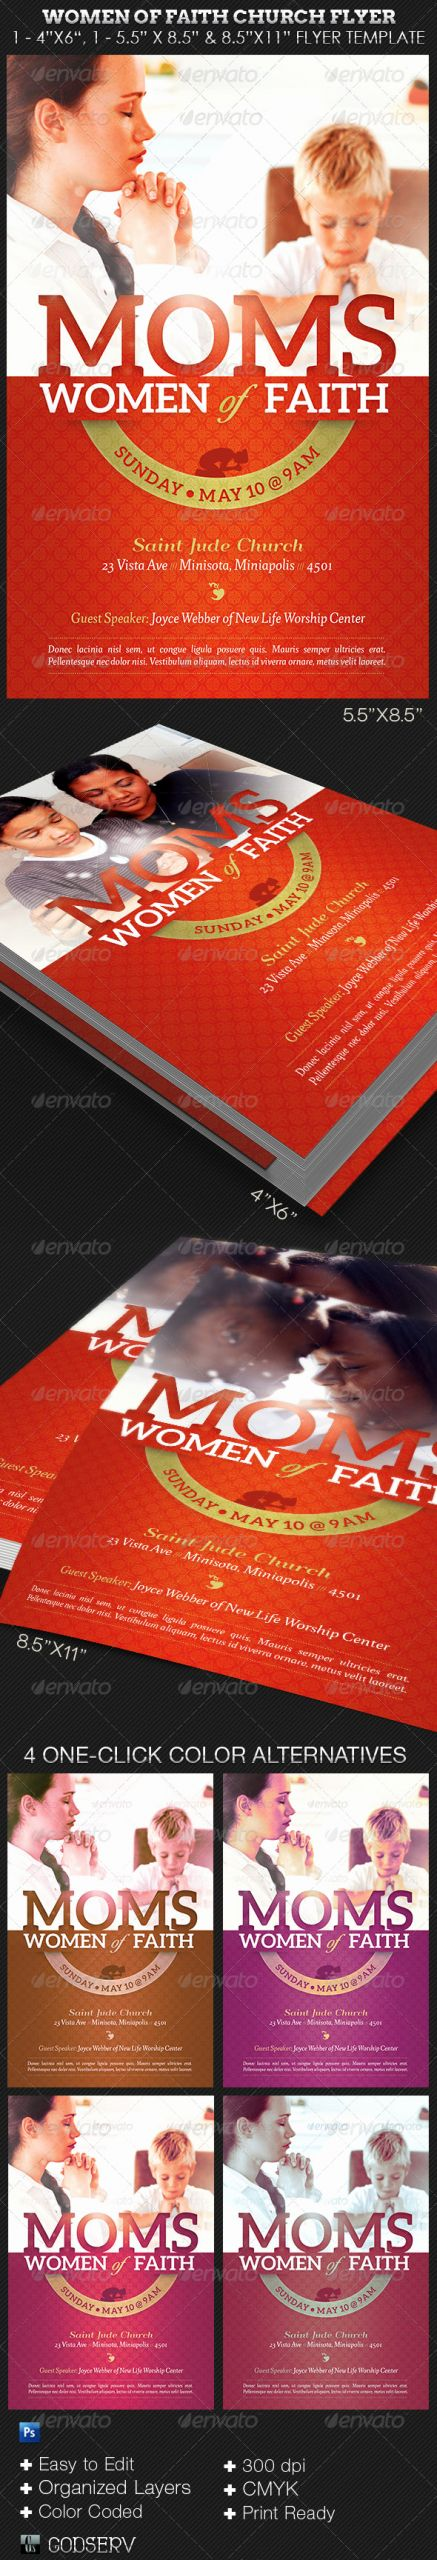 Bible Study Invitation Template Fresh Women Of Faith Church Flyer Shop Template